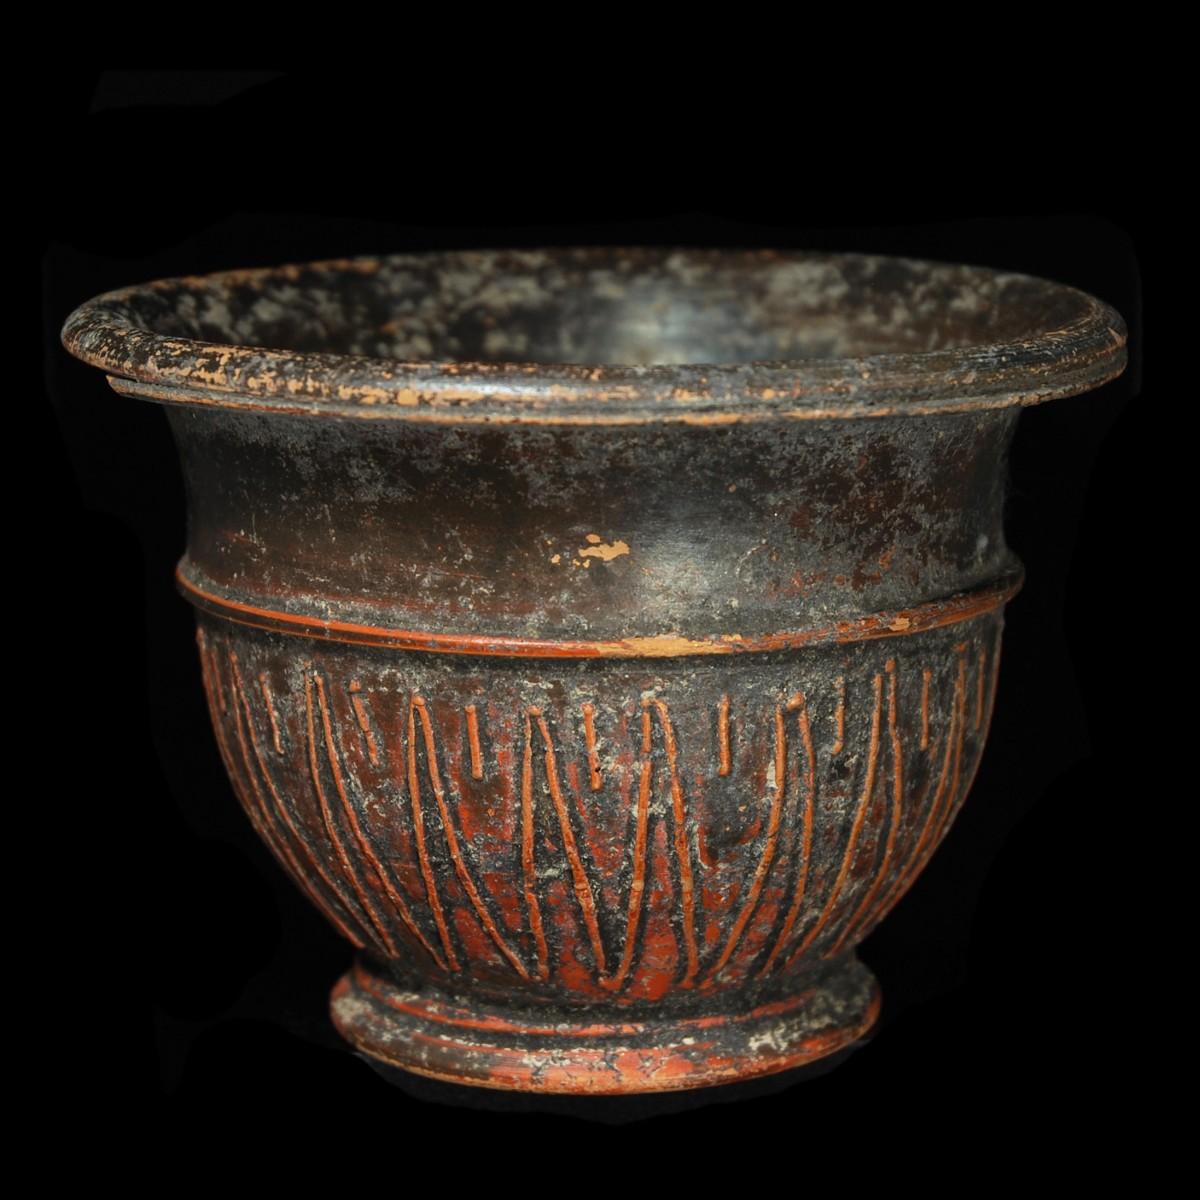 Roman terracotta relief bowl